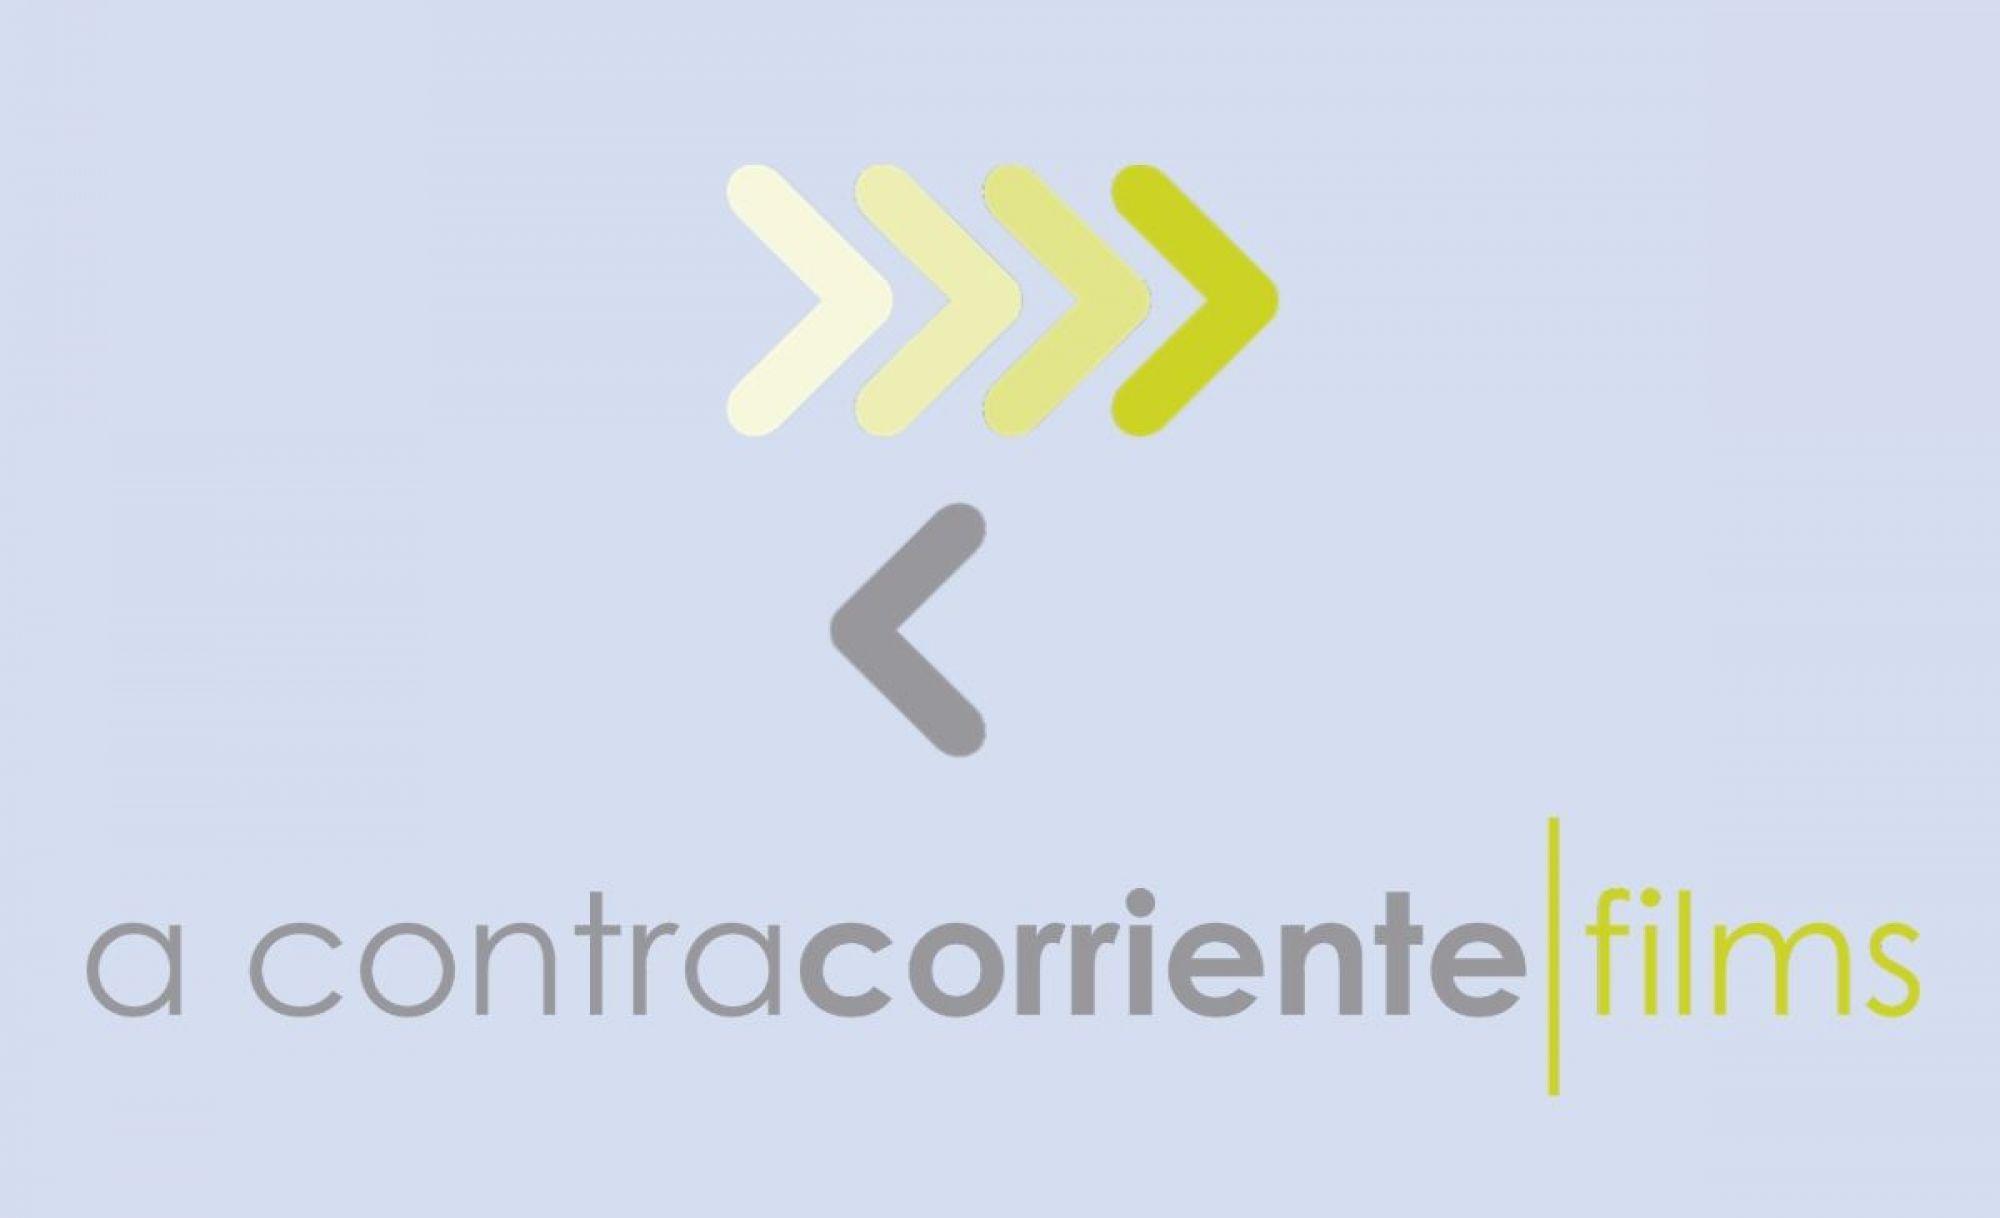 AContracorriente Films_